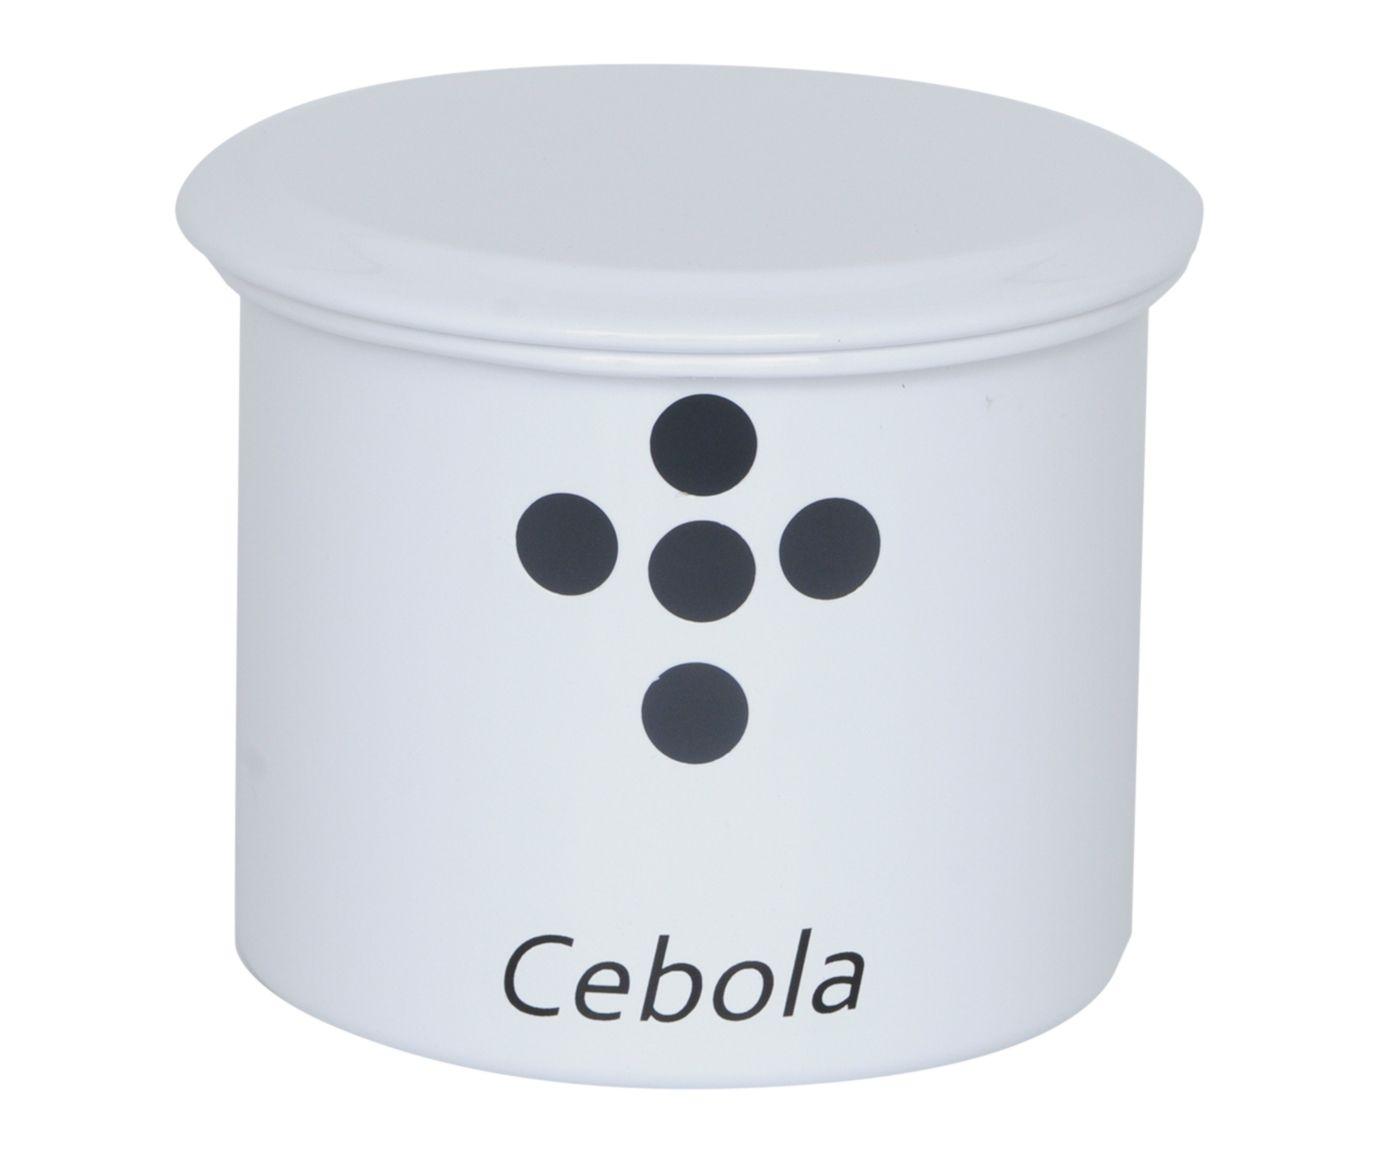 Porta-Cebola Lille - Branco   Westwing.com.br